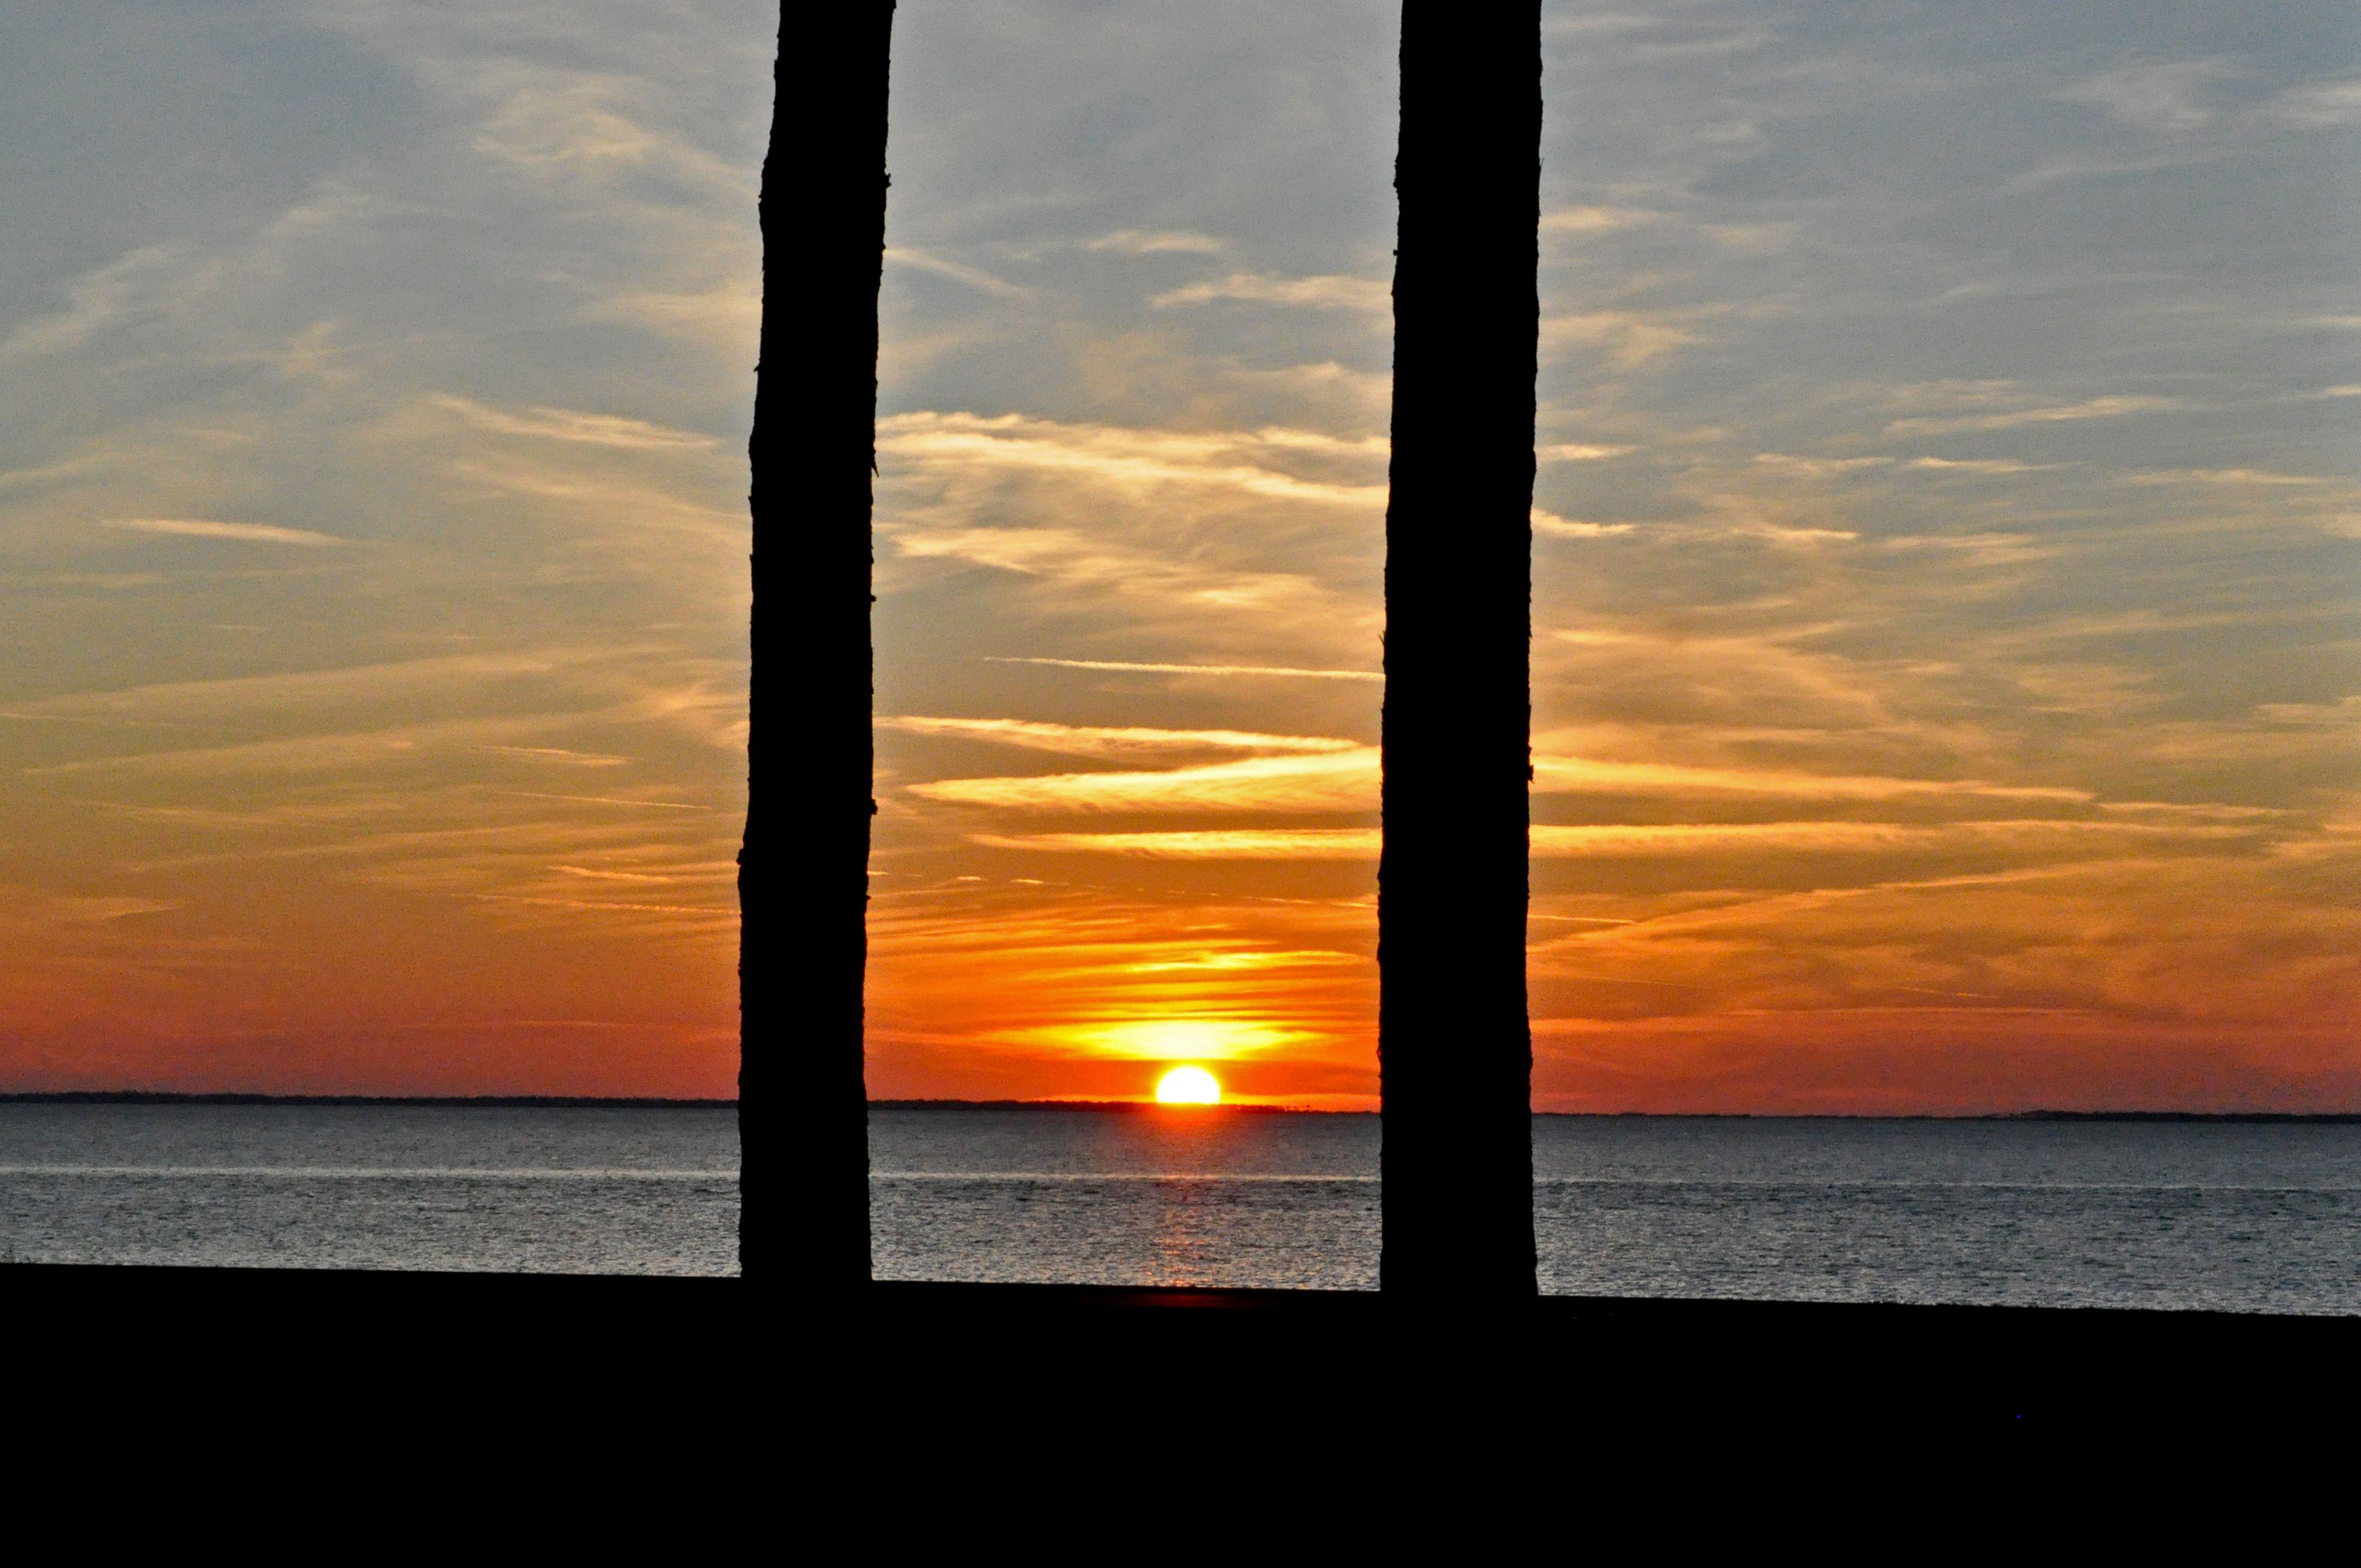 Port St. Joe, FL. Home Sweet Home!!